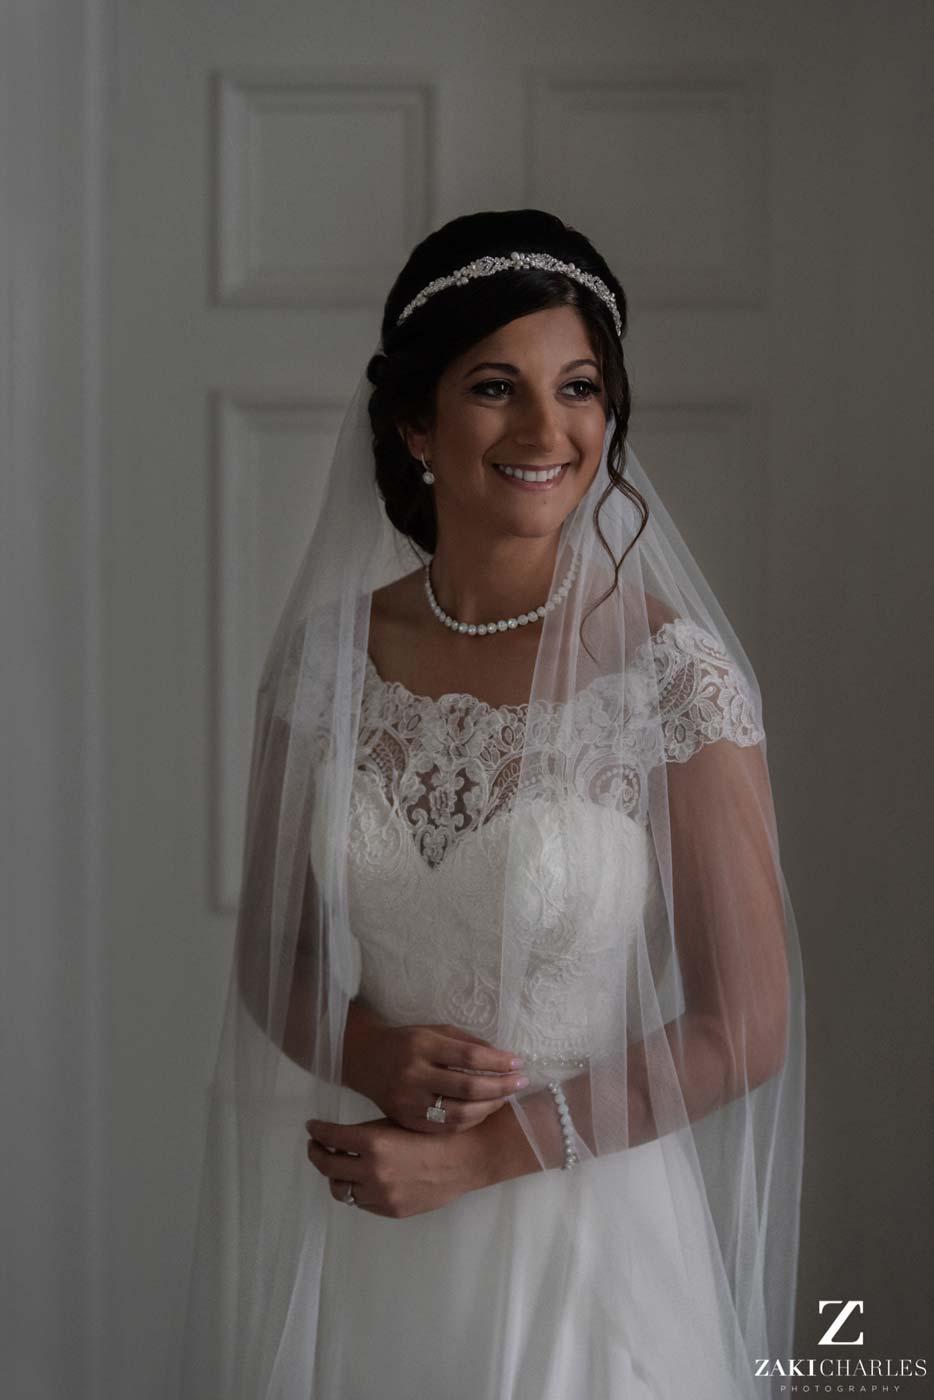 Natural light portrait of the bride smiling